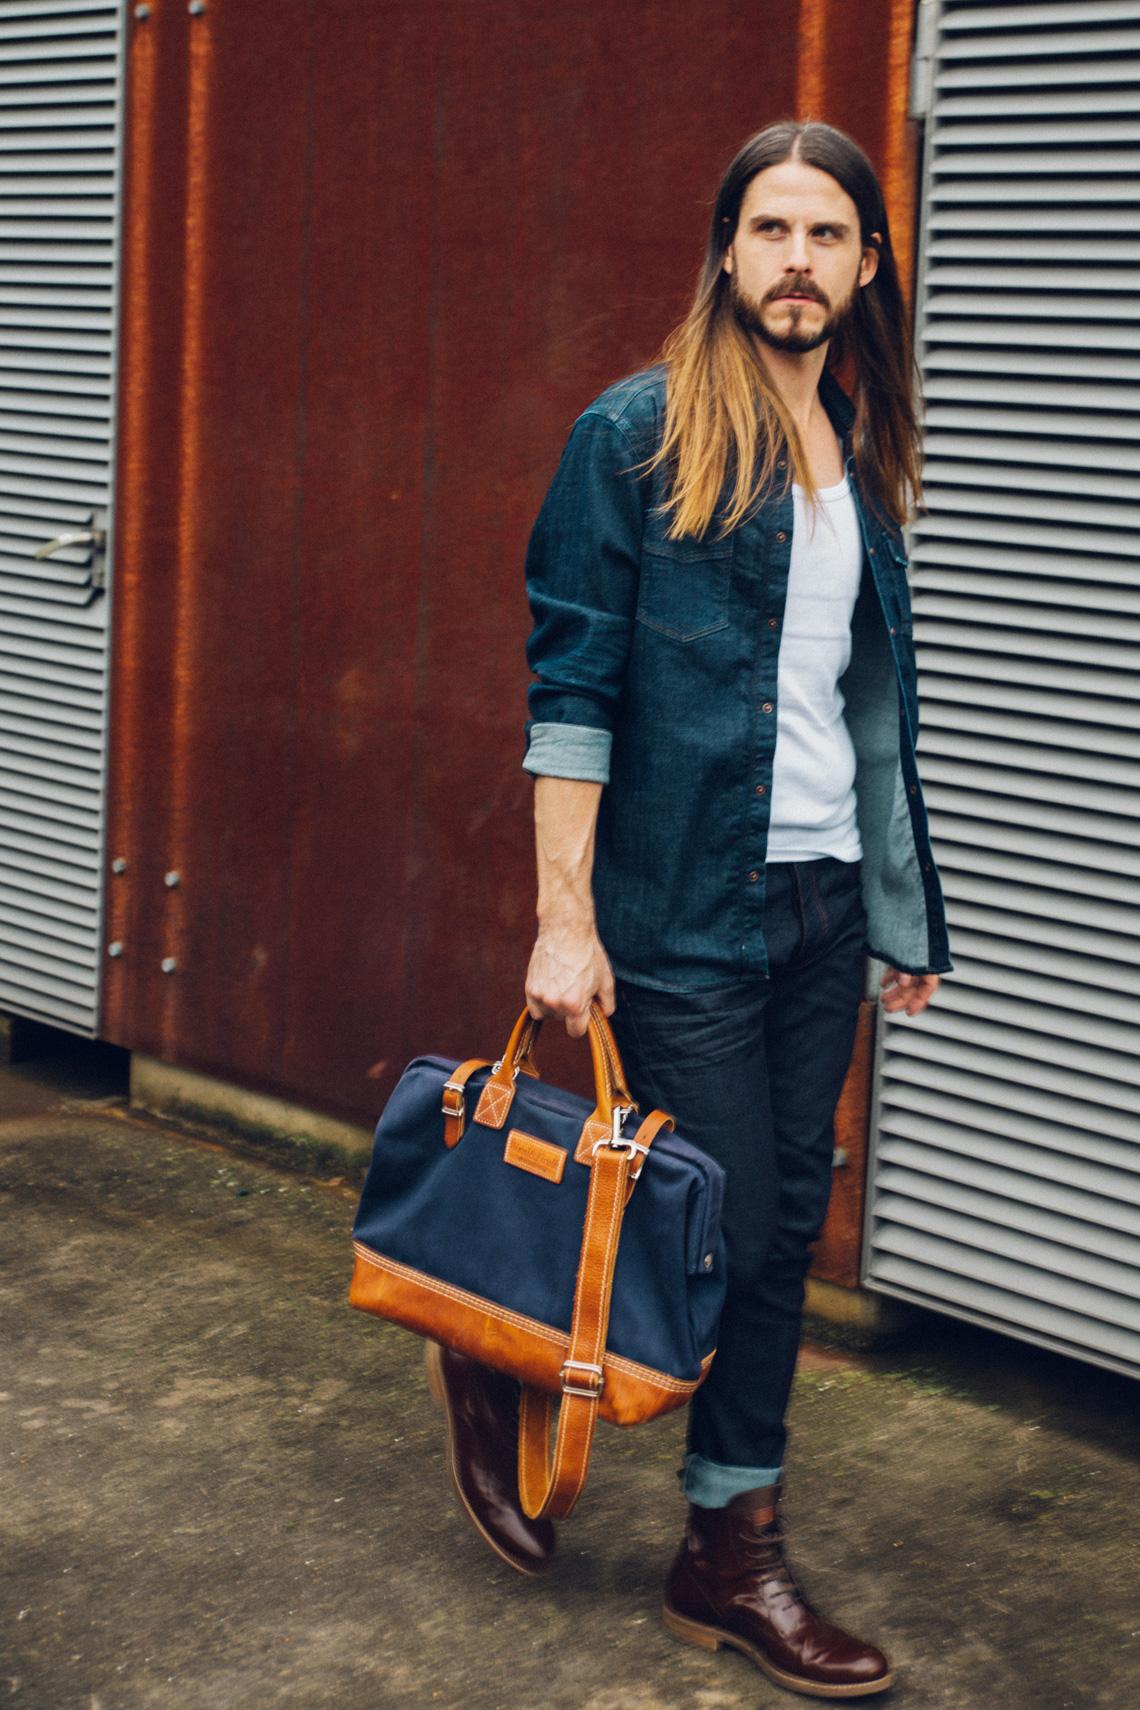 Modeblog-Männer-Fashion-Kaisers-neue-Kleider-Denim-Outfit-Cross-Jeans-Boots